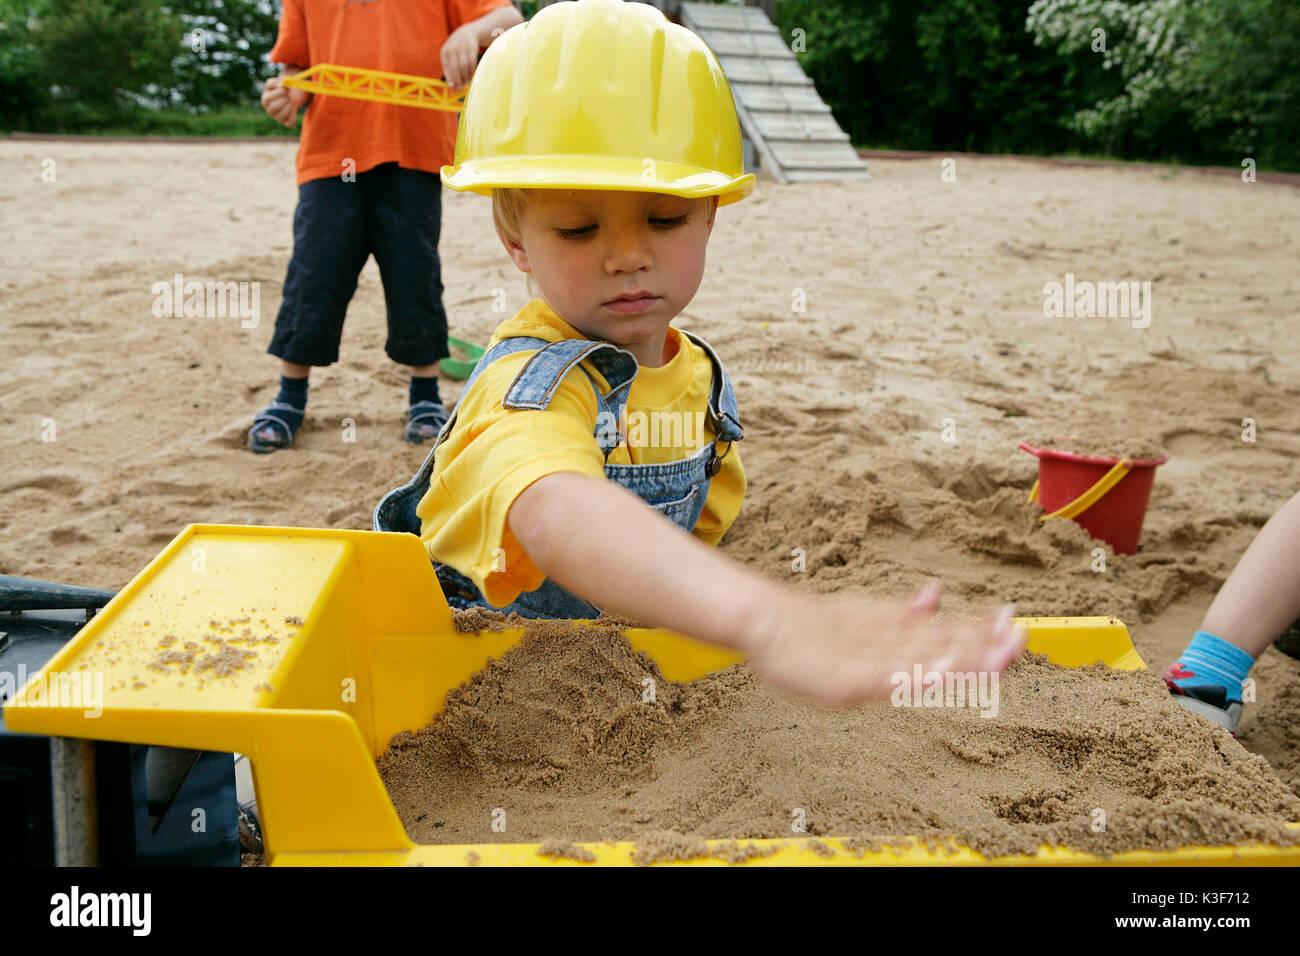 Child at the sandbox - Stock Image